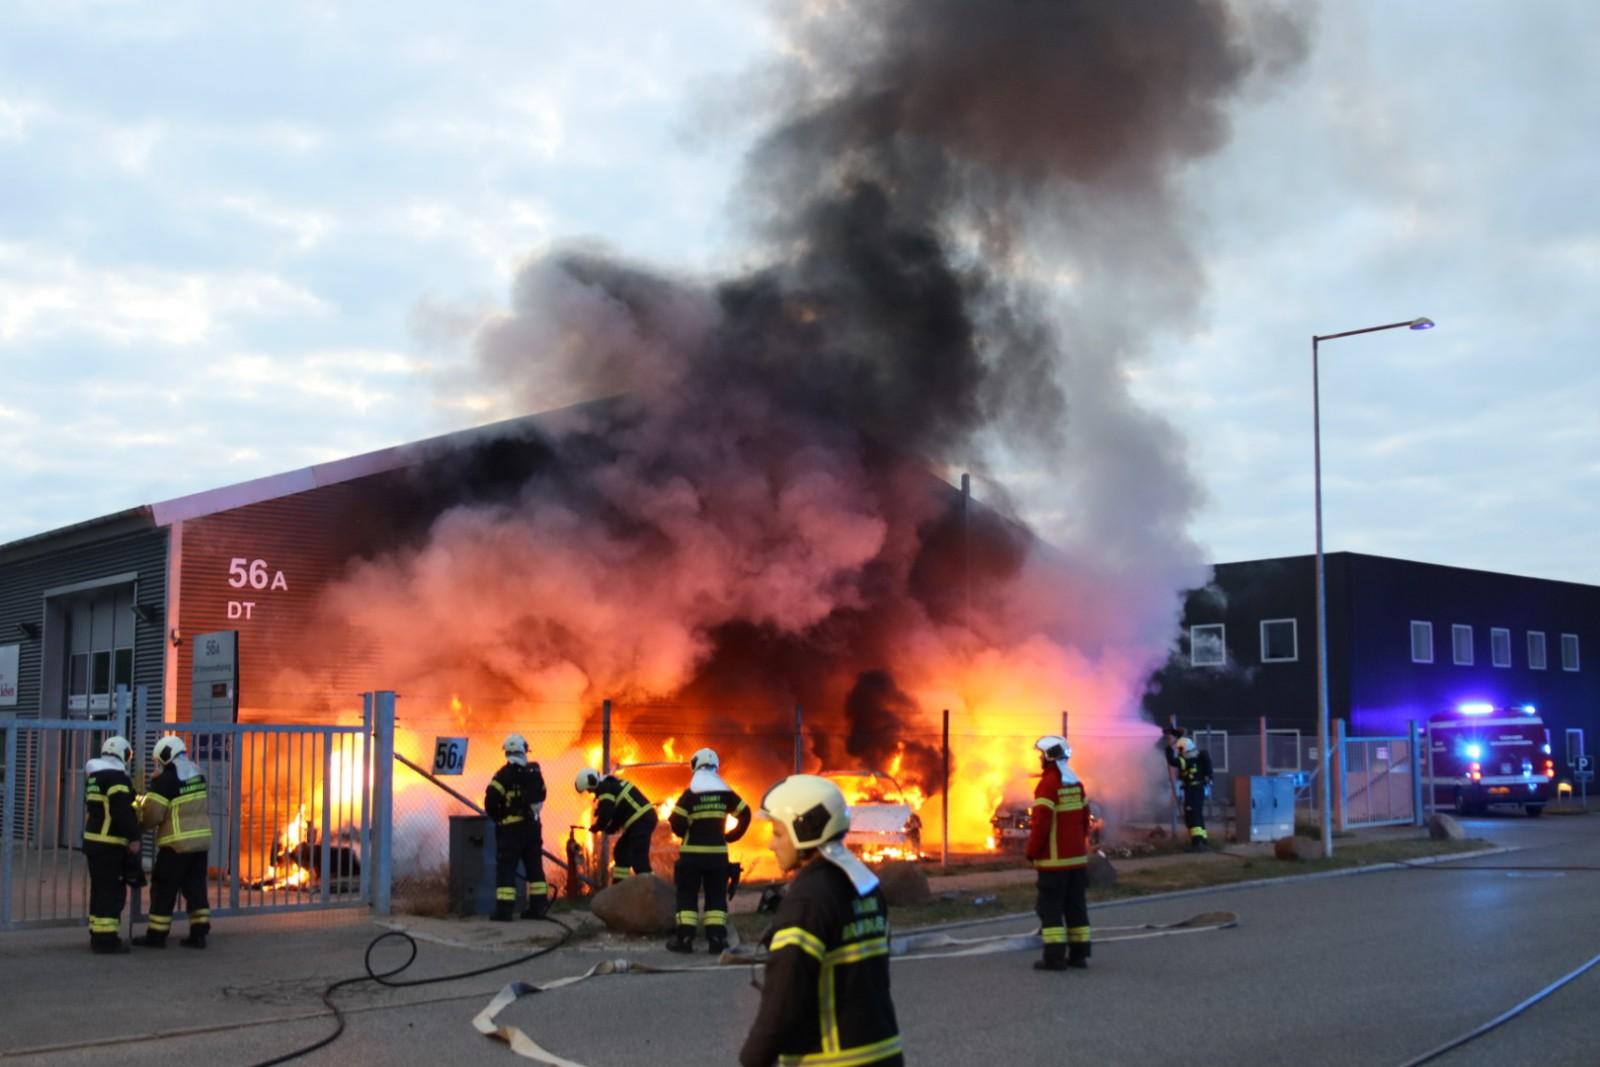 Brand hos bilfirma - flere biler i brand